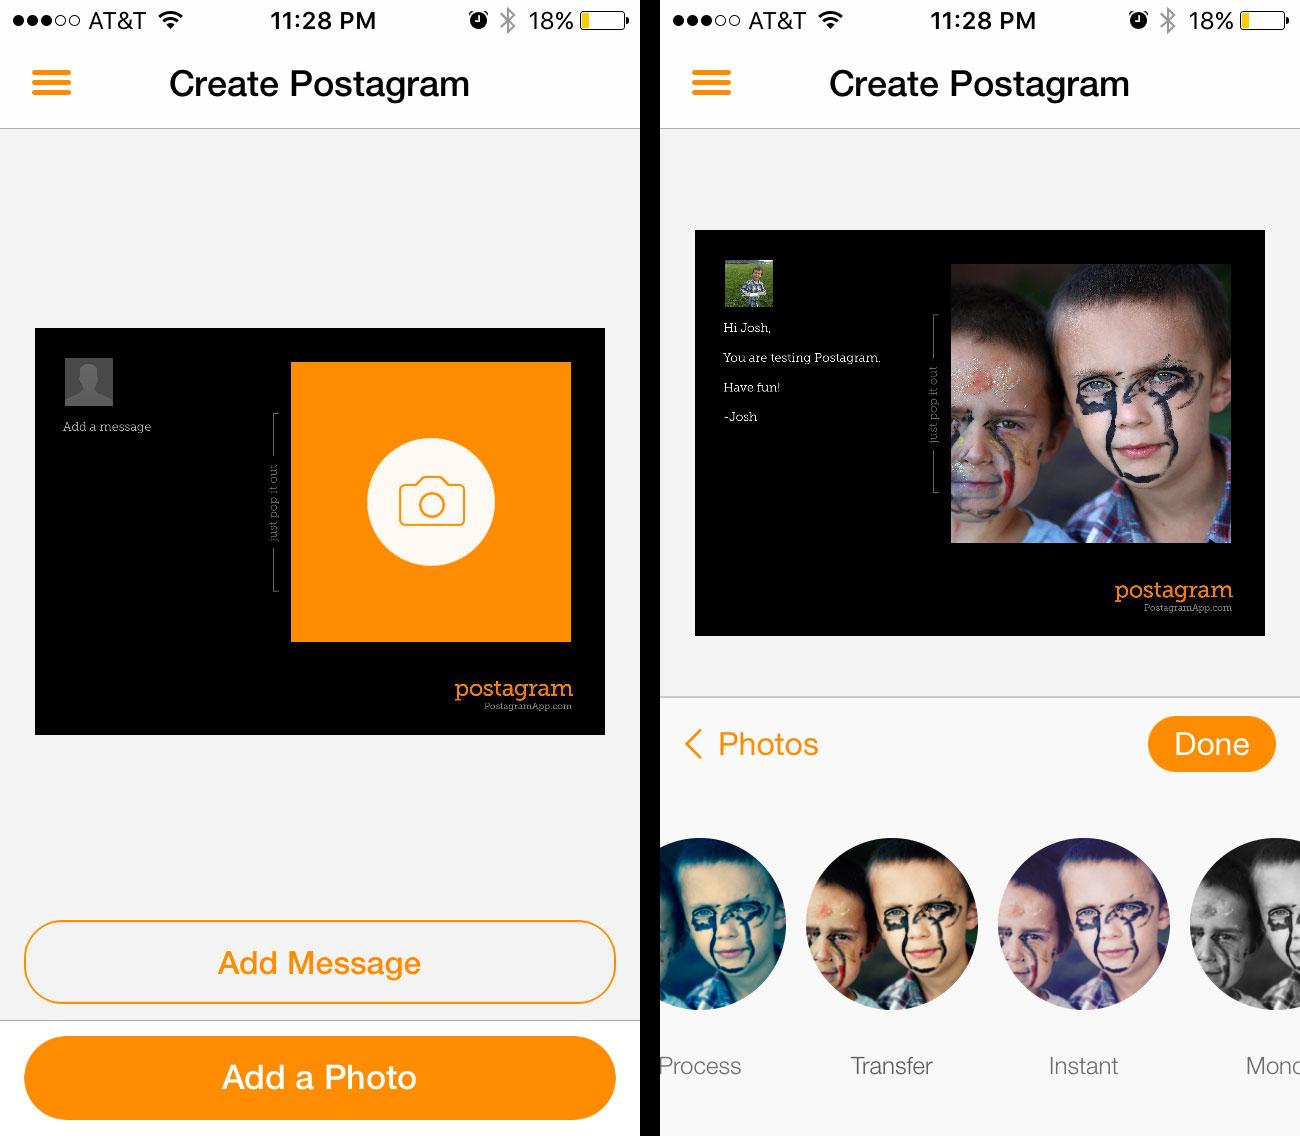 Youve Got Mail Five Photo Postcard Apps Tested Digital